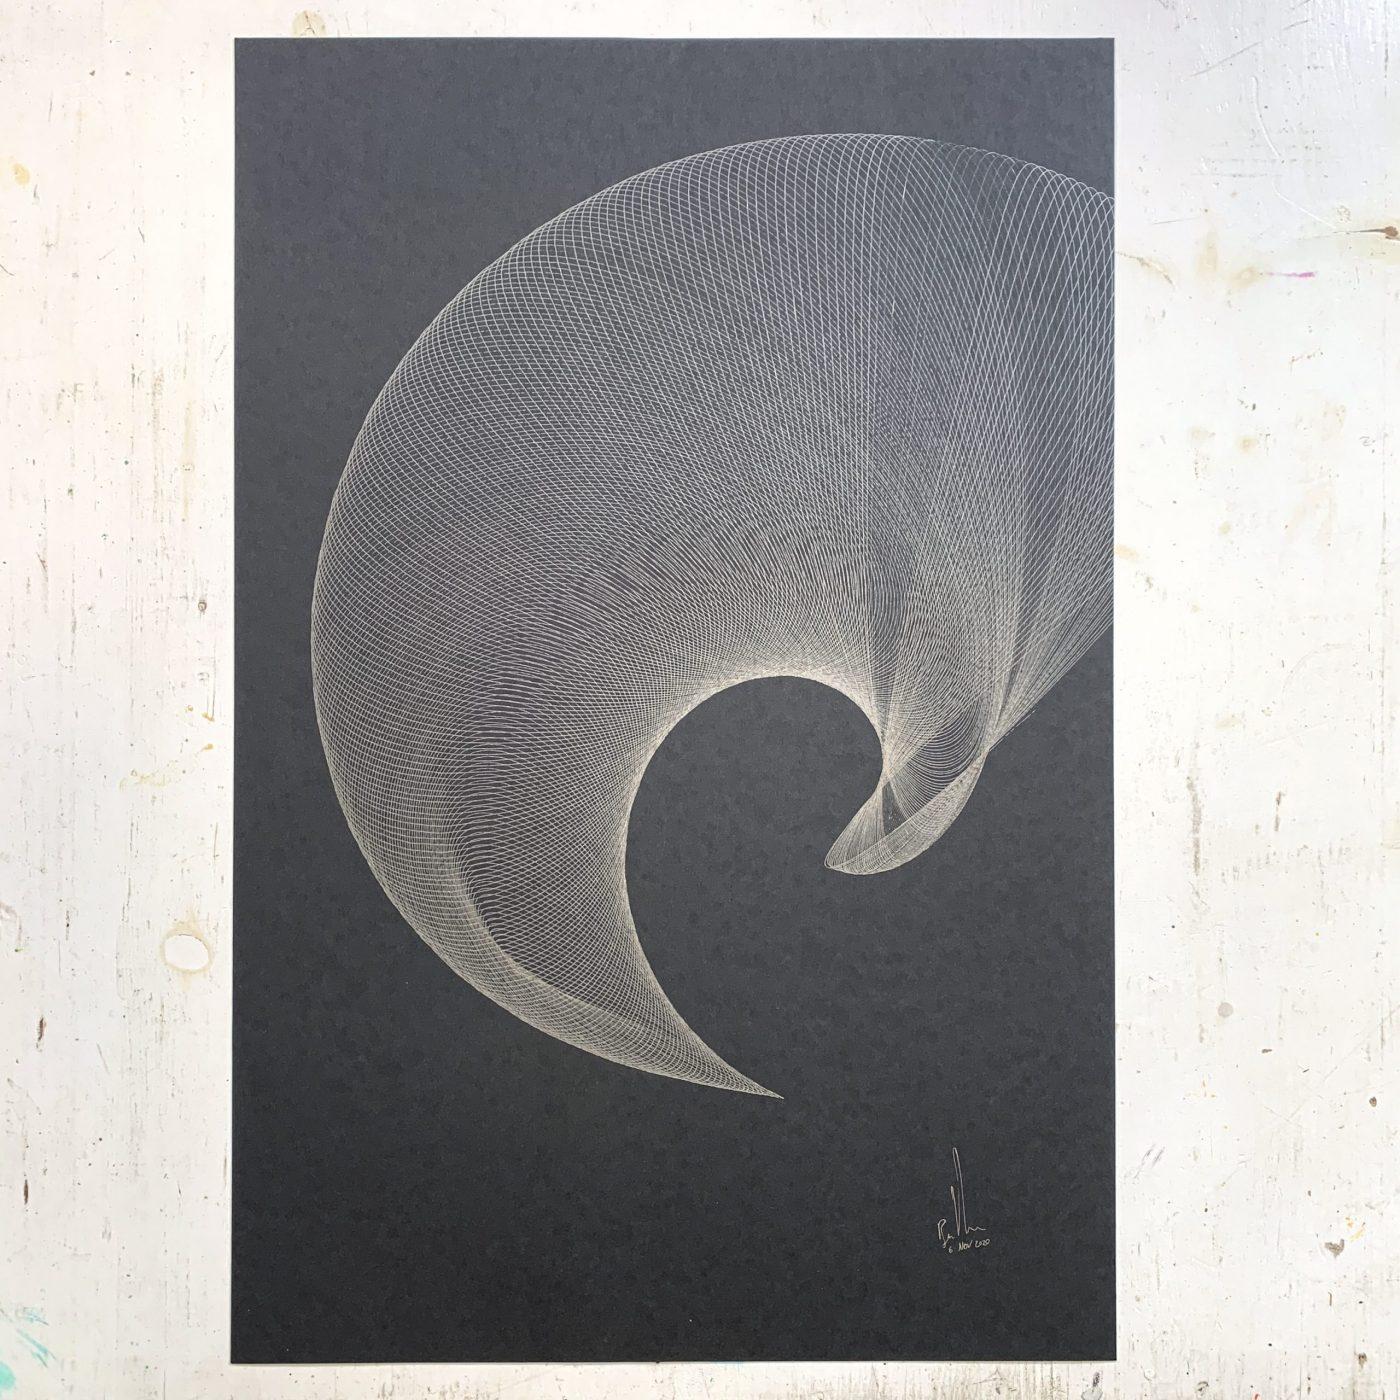 x311 - 6 Nov